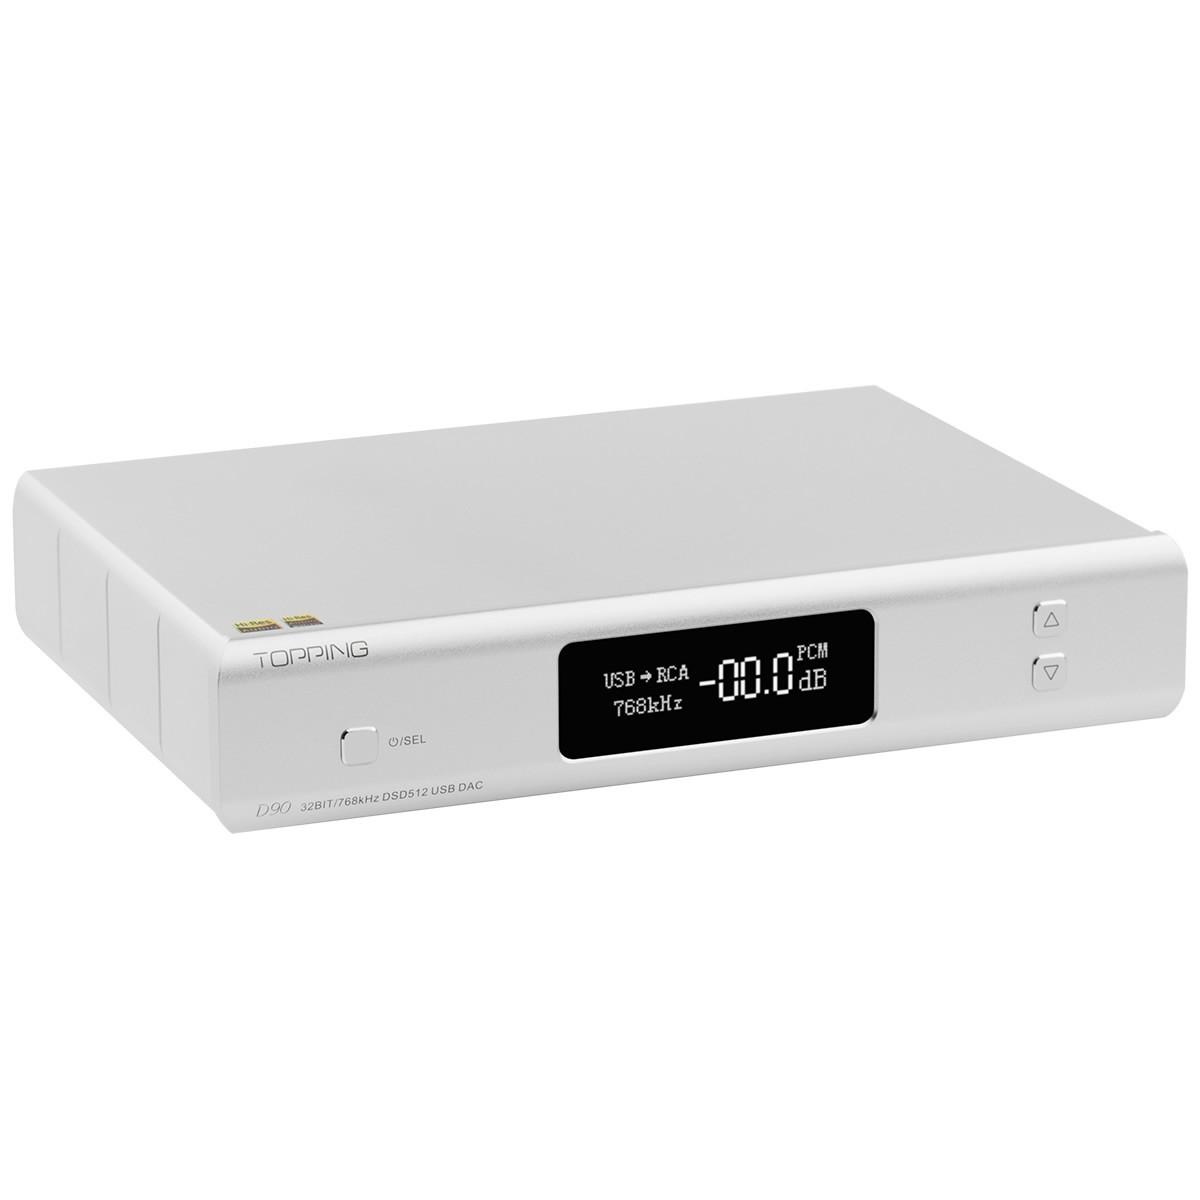 TOPPING D90 Balanced DAC AK4499 XMOS XU208 I2S 32bit 768kHz DSD512 Bluetooth 5.0 Silver